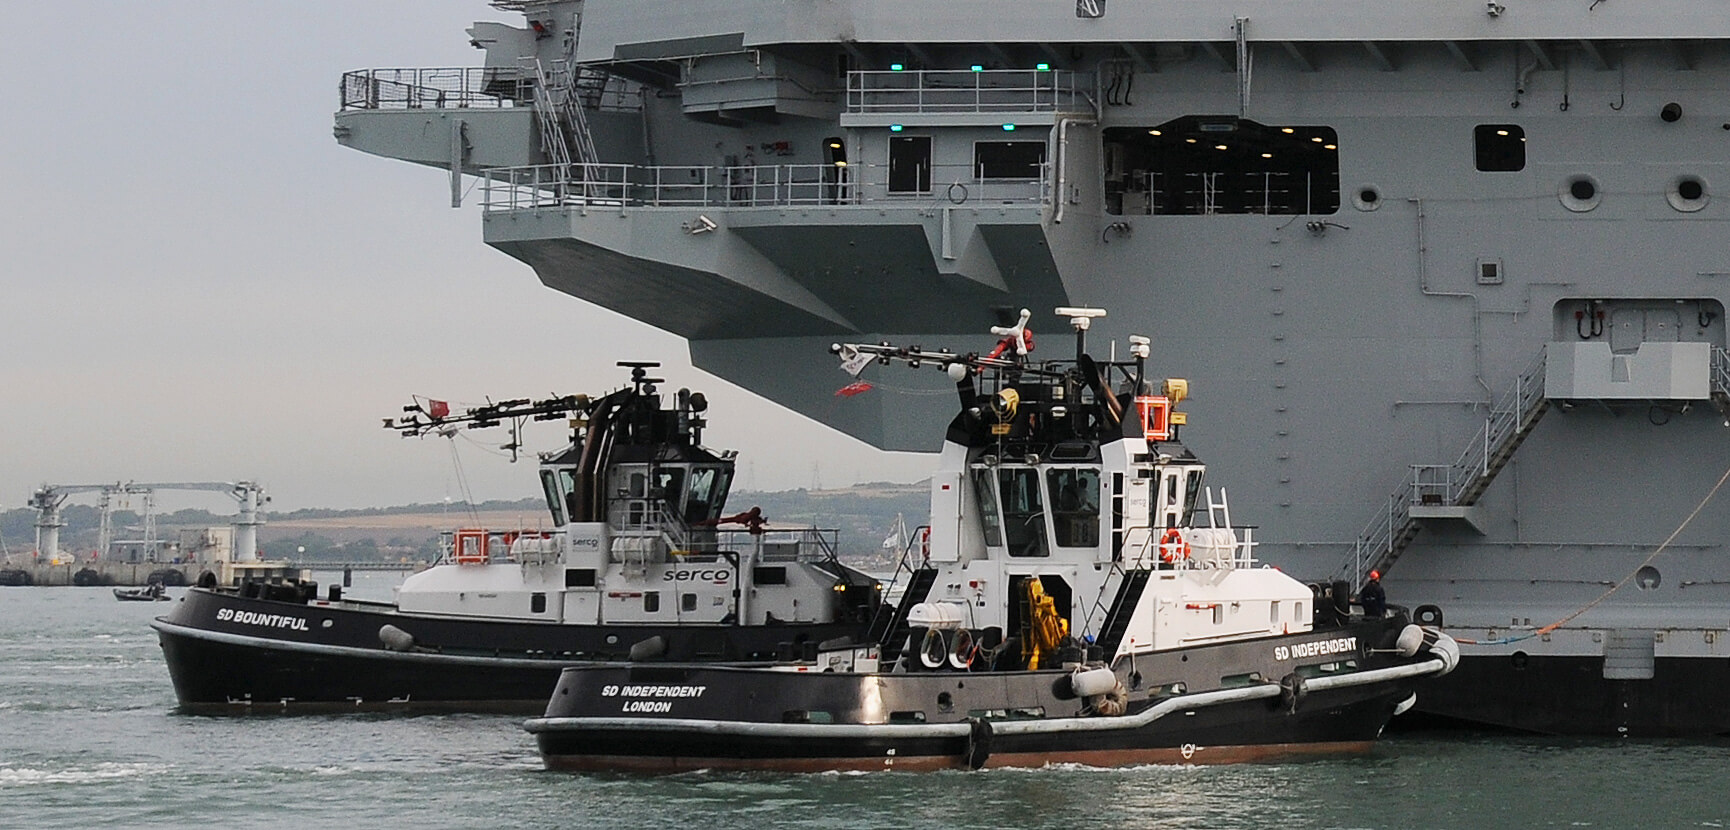 Serco tugs assist HMS Queen Elizabeth